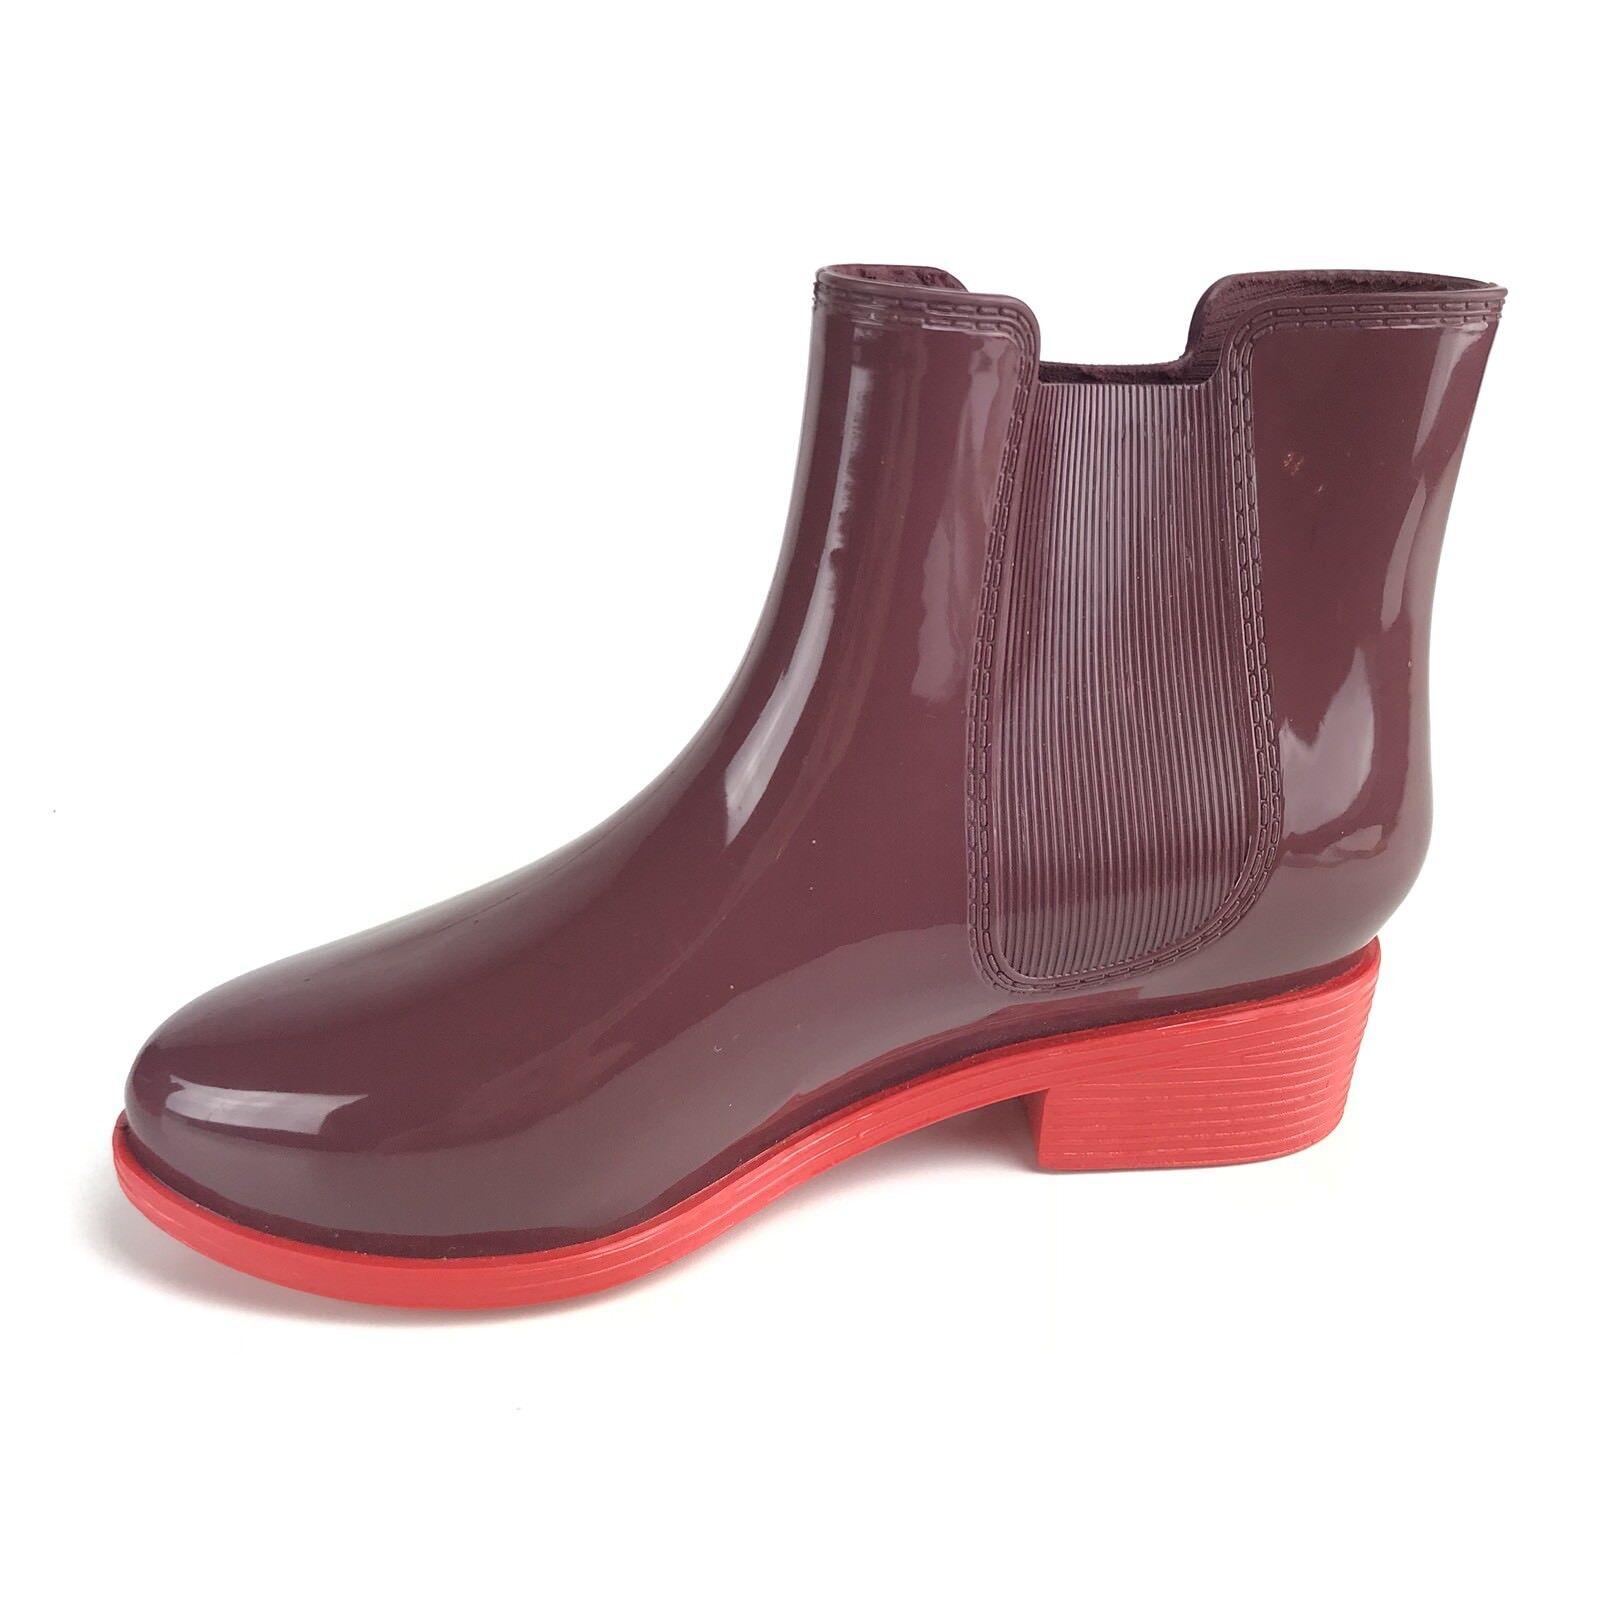 American Apparel zapatos Talla 5 mujer Ankle Rain botas púrpura rojo Sole  80